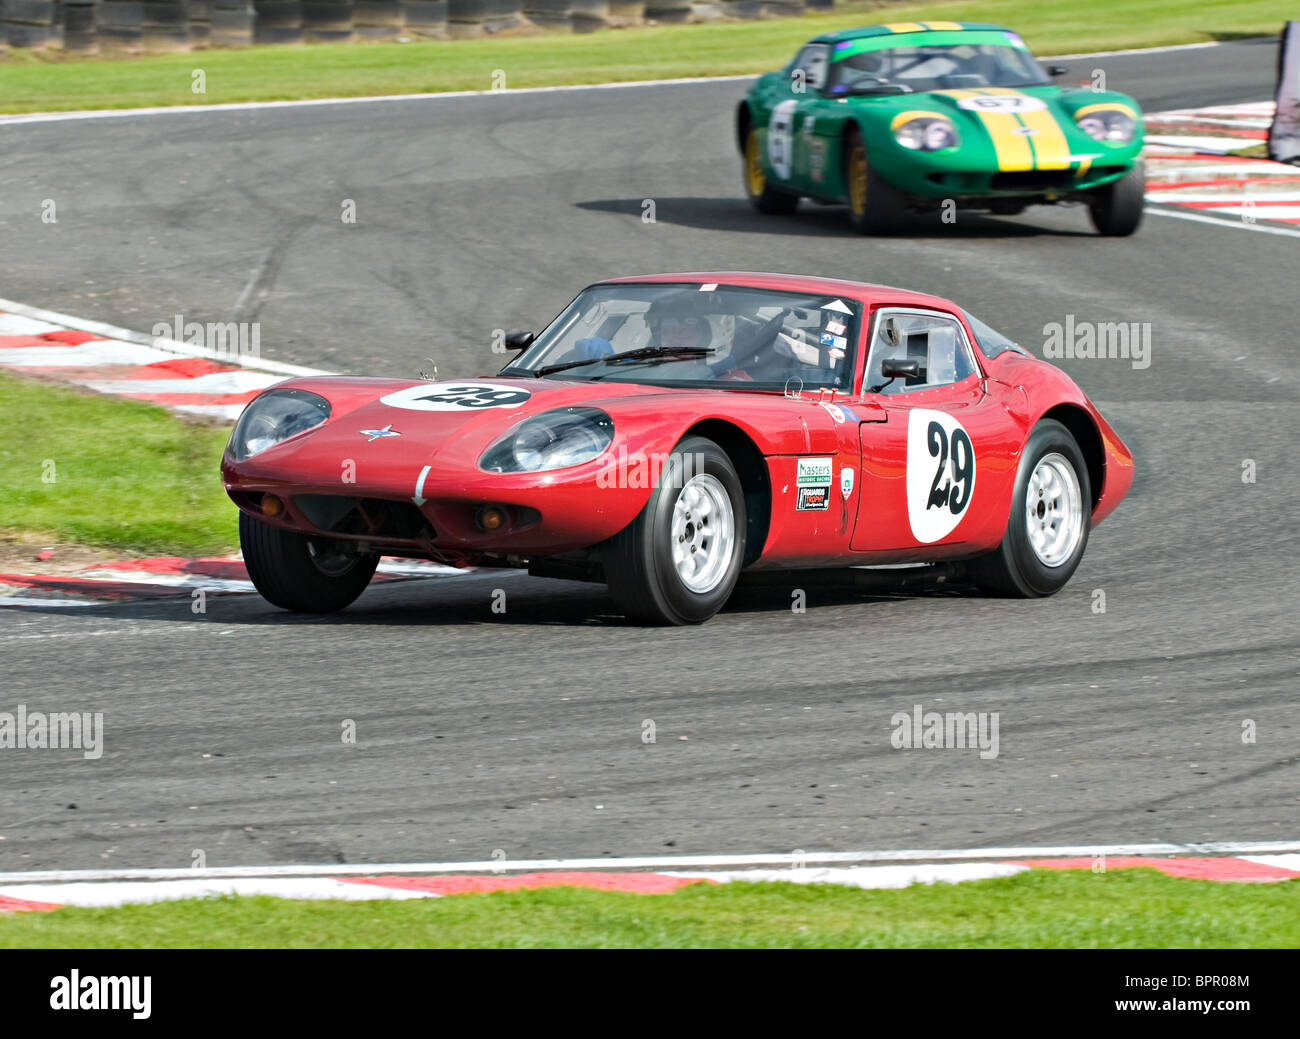 Gt Race Cars Stock Photos Gt Race Cars Stock Images Alamy